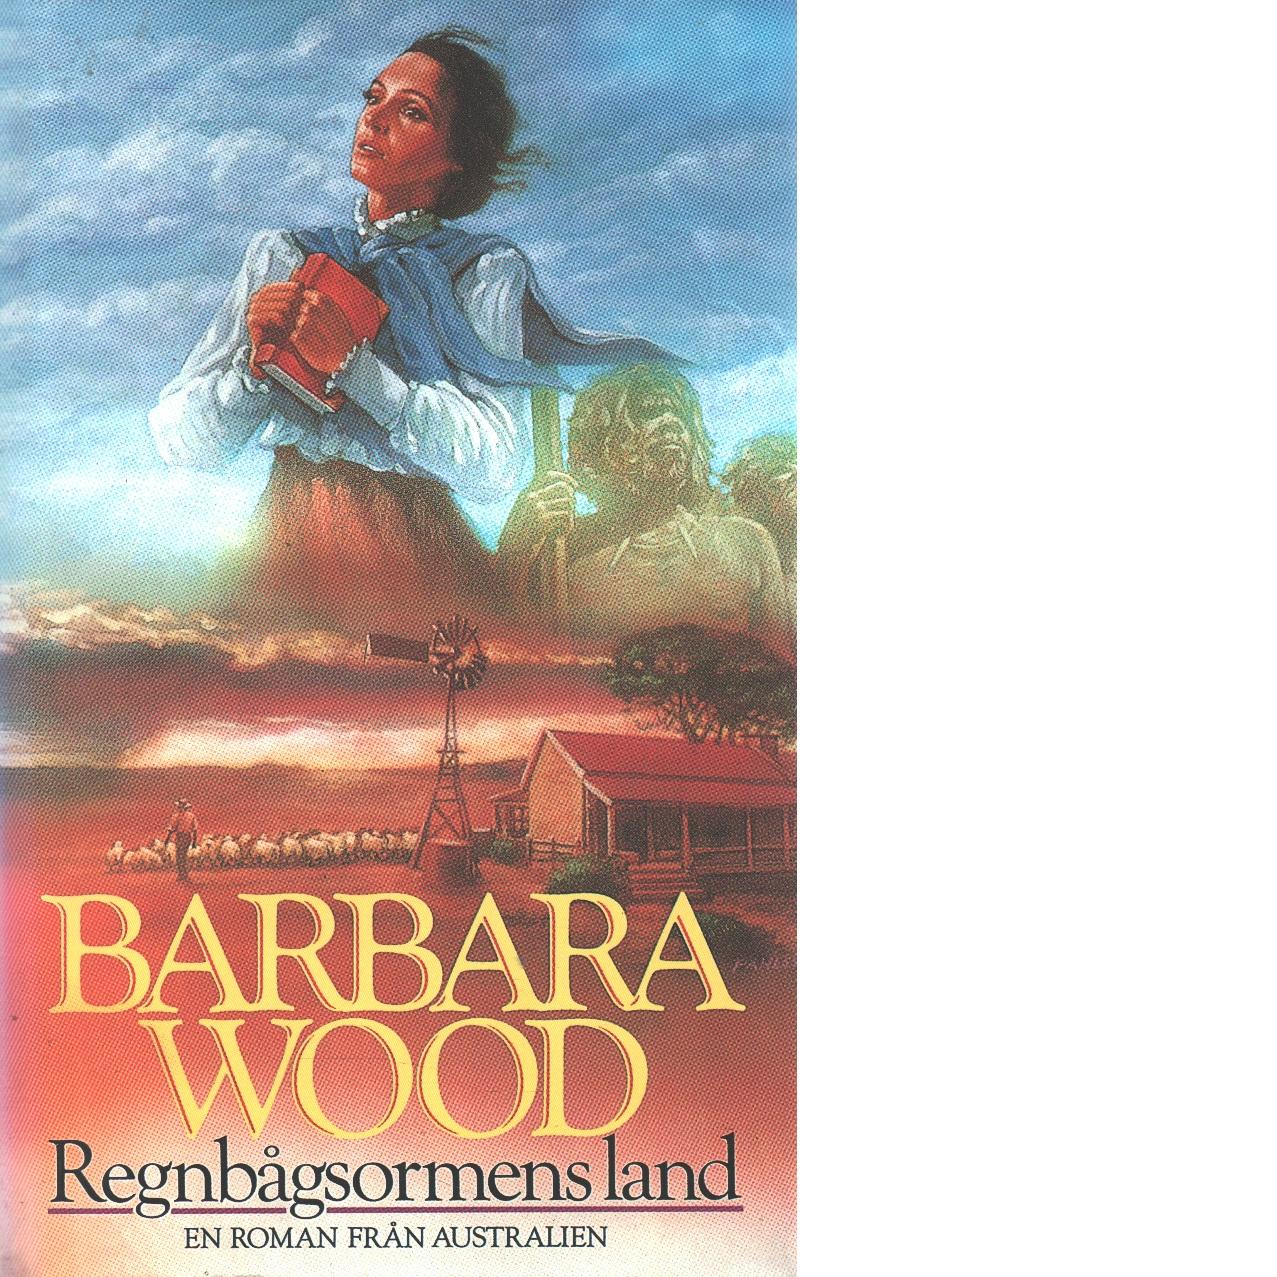 Regnbågsormens land - Wood, Barbara